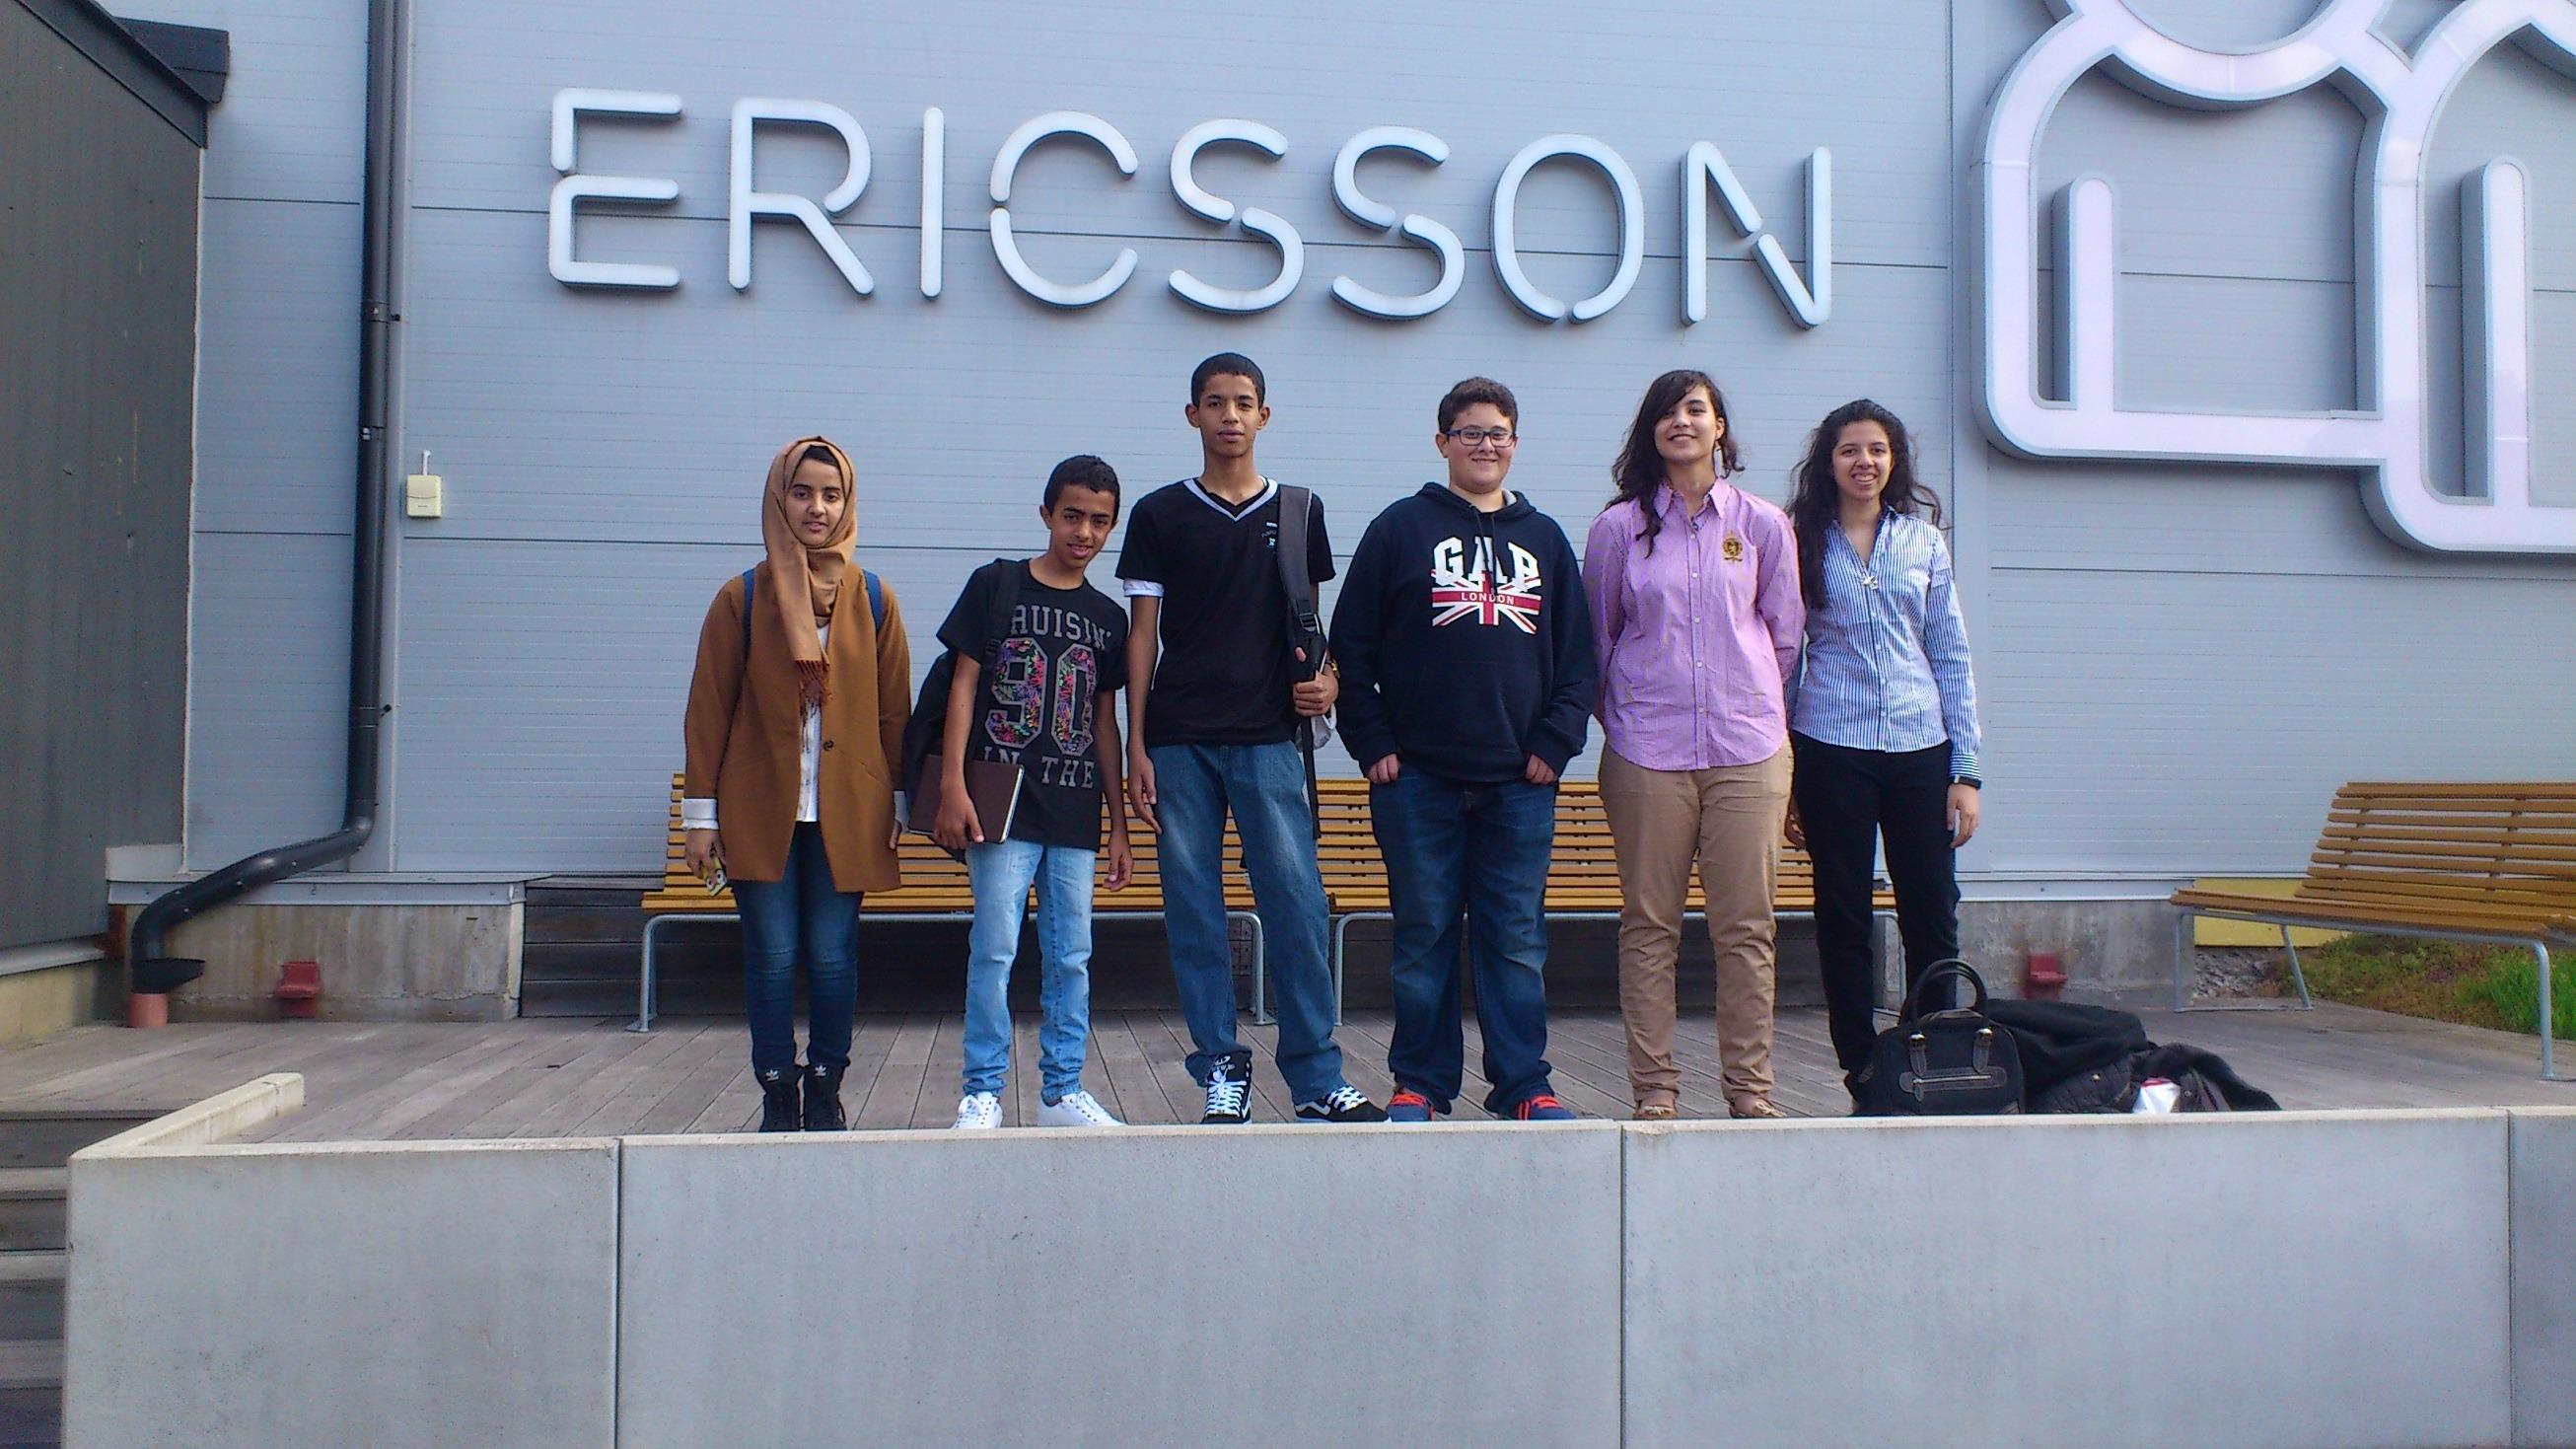 http://shbabbek.com/upload/للطلاب.. فرصة سفر للسويد والمكسب نصف مليون جنيه